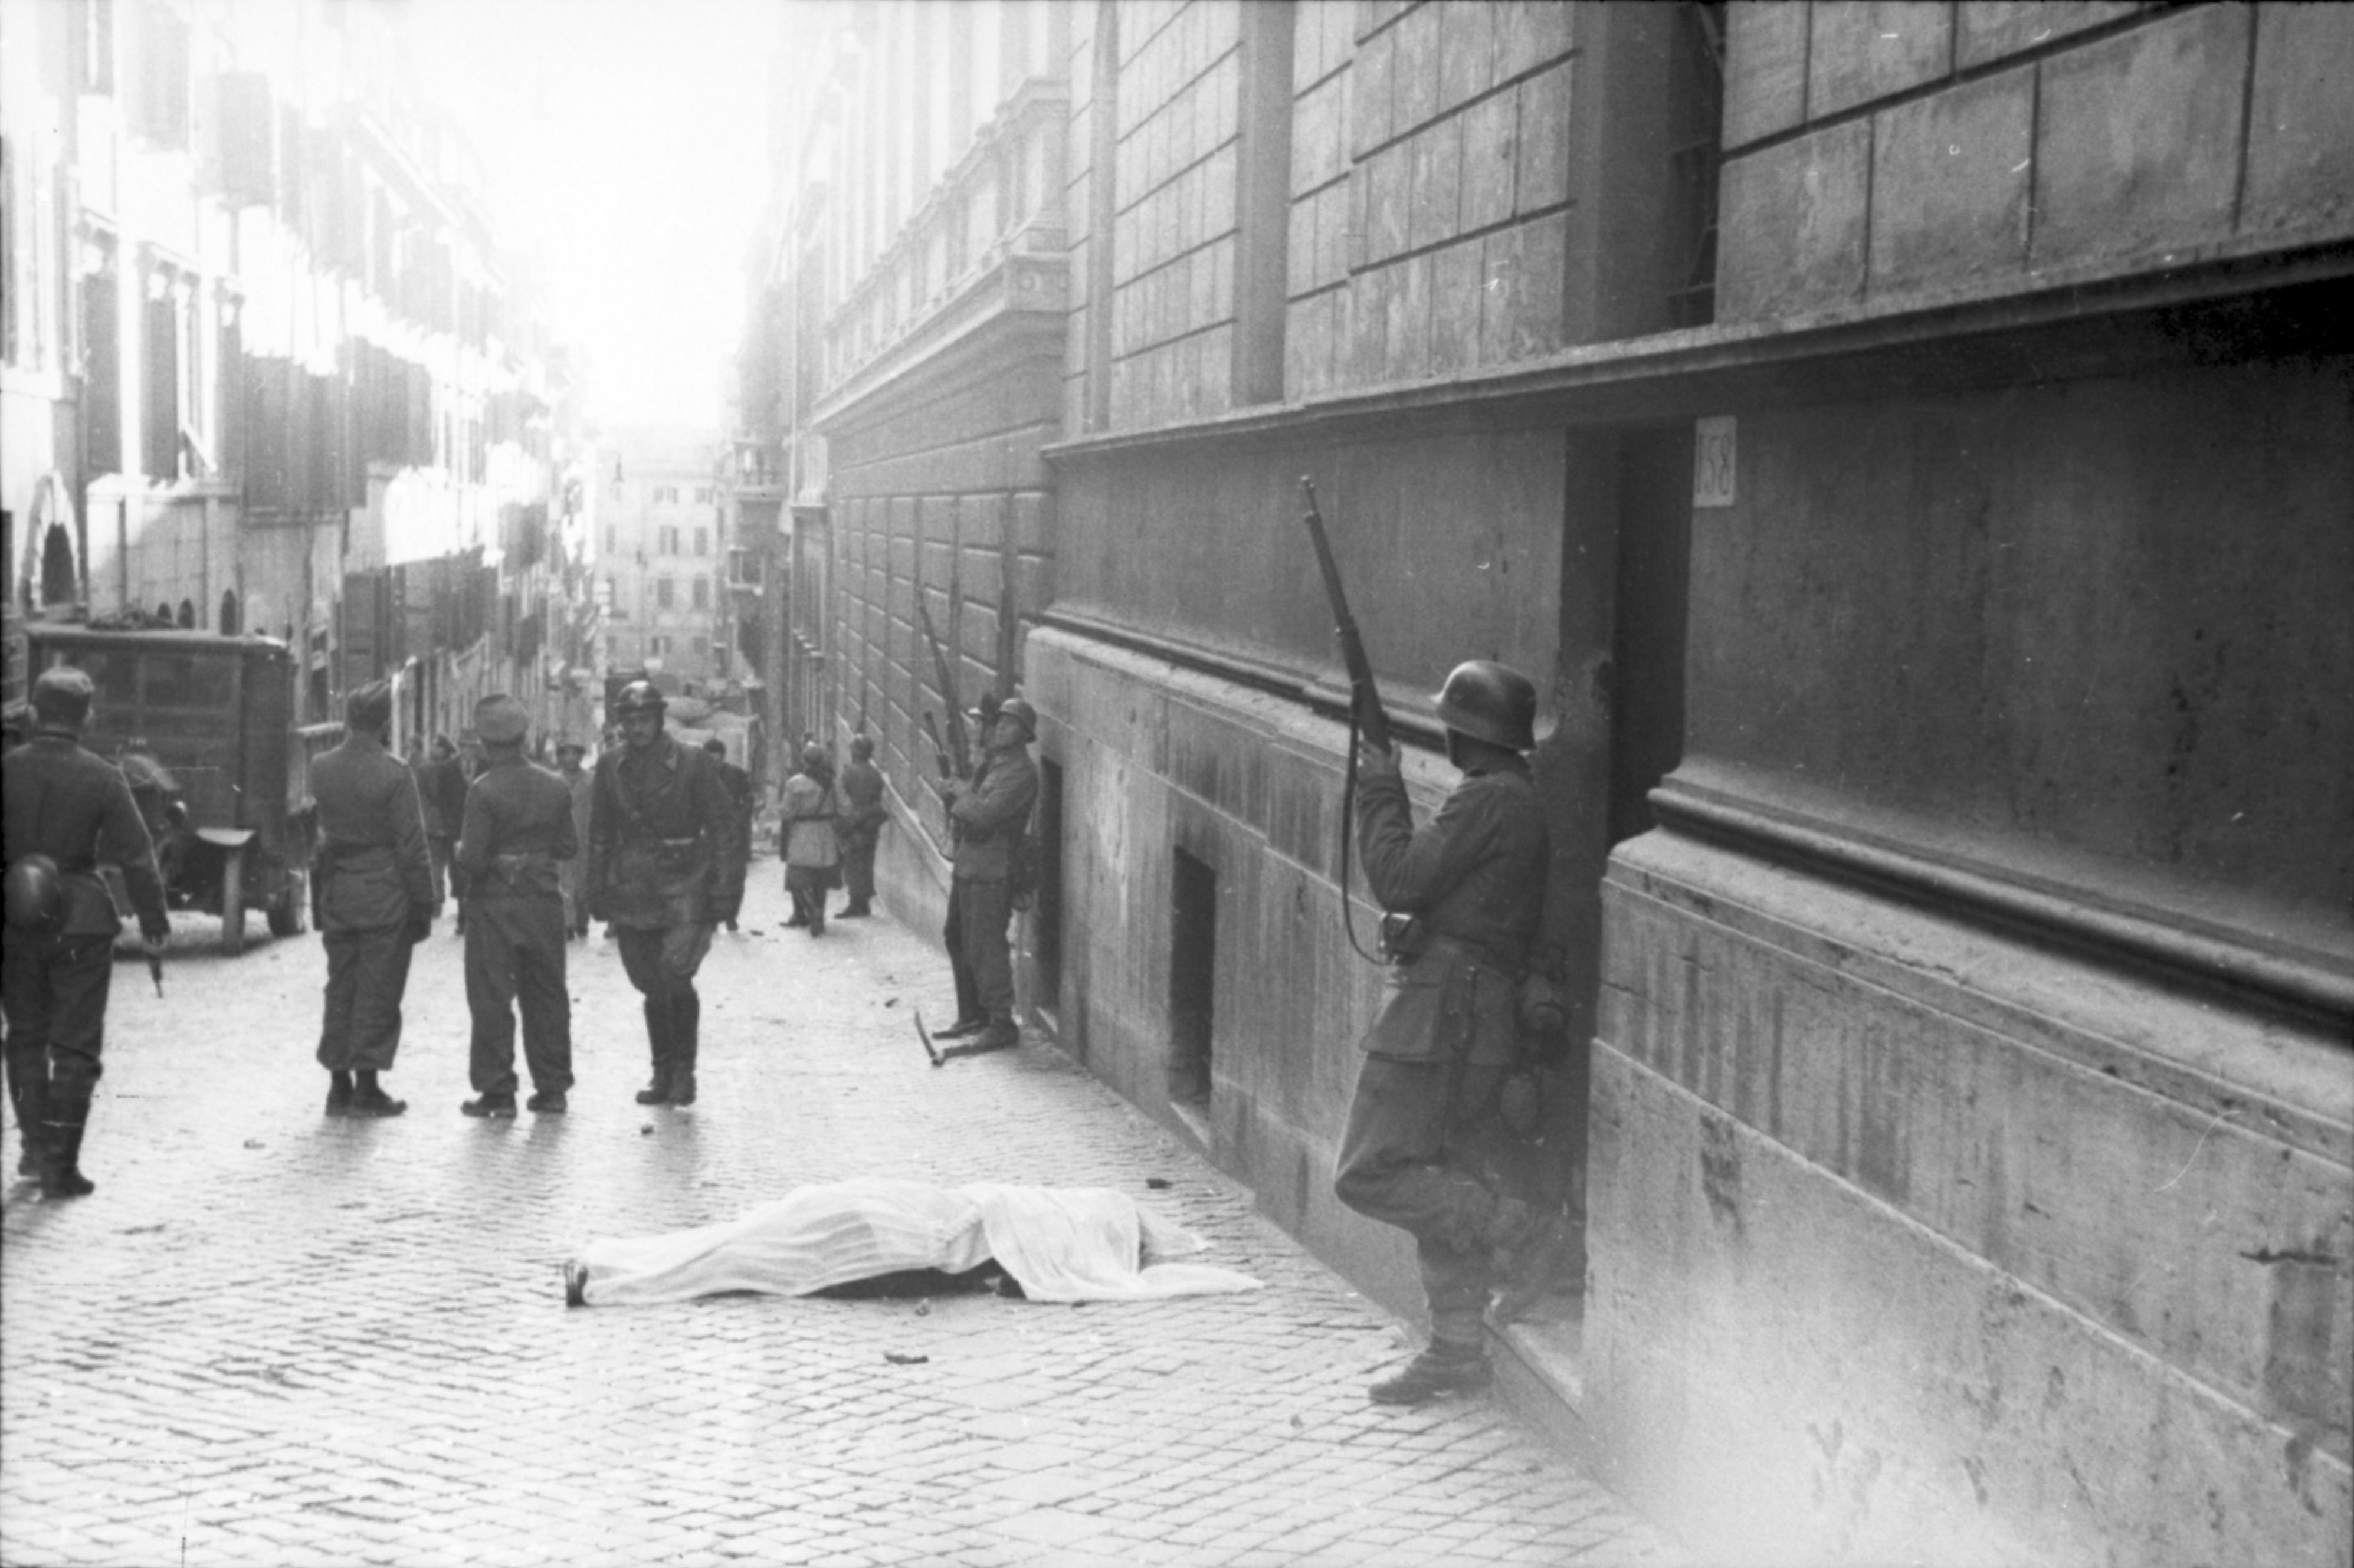 File:Bundesarchiv Bild 101I-312-0983-10, Rom, Soldaten vor Gebäude.jpg